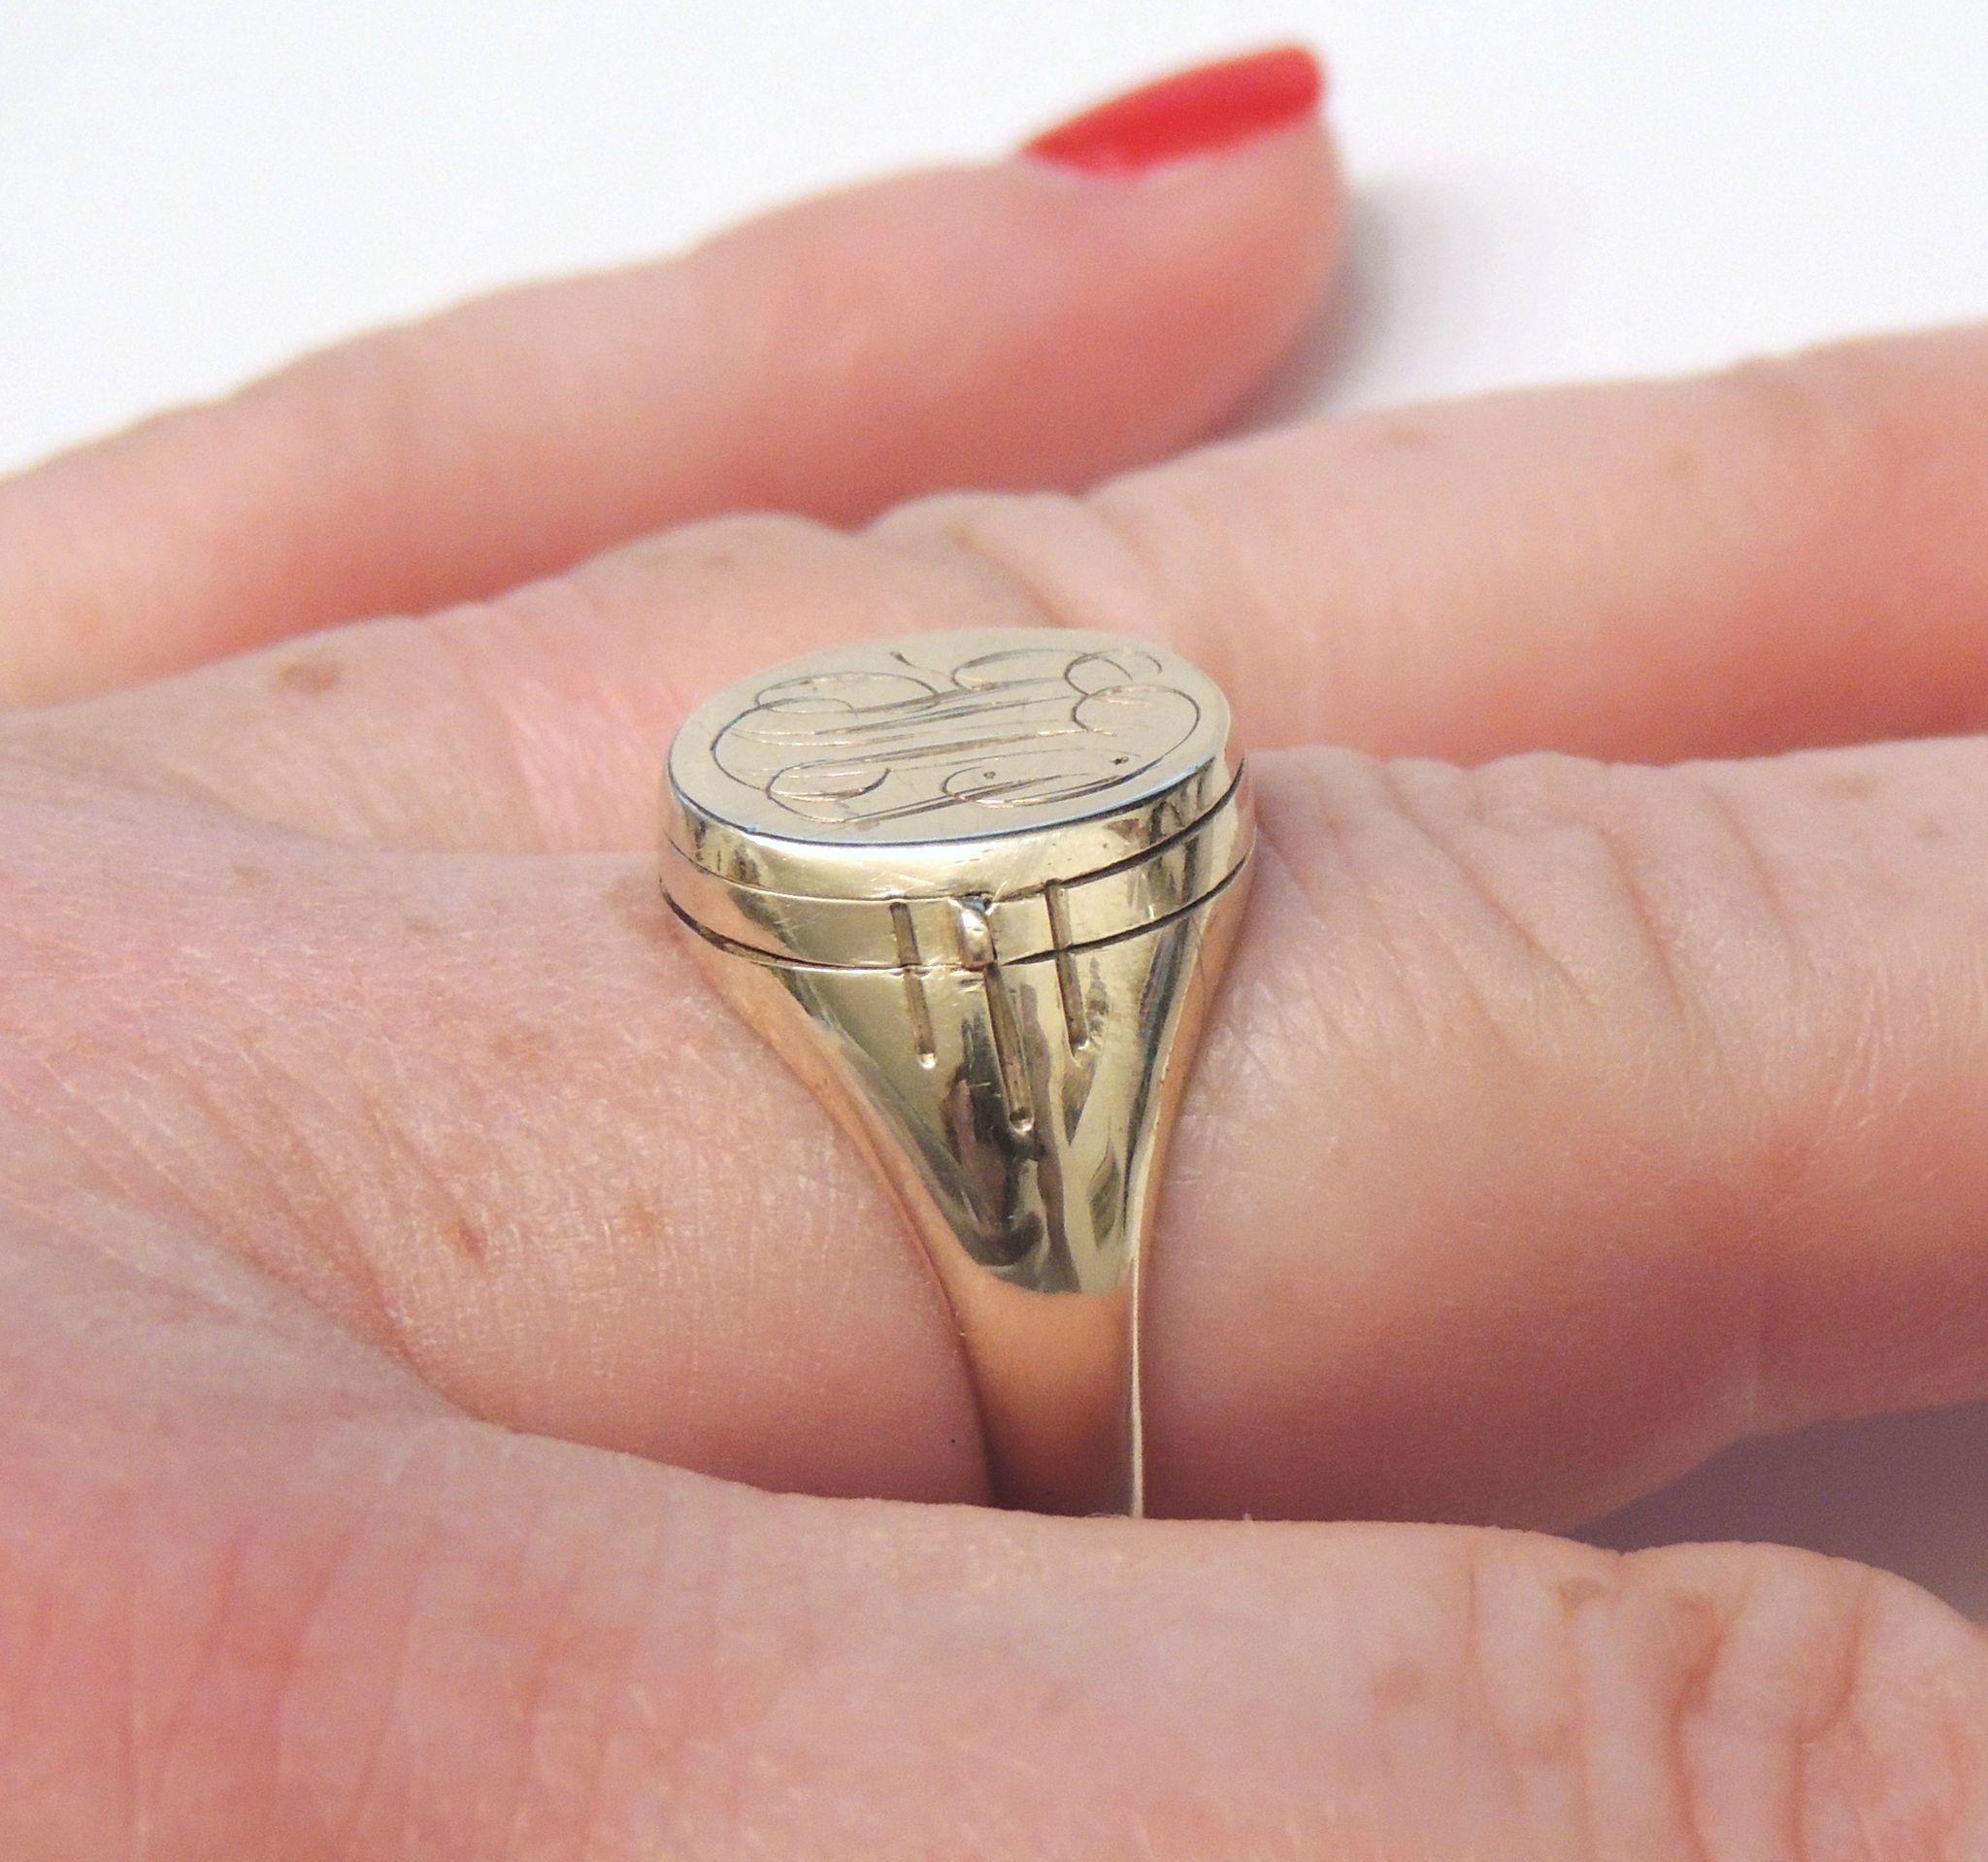 1940\'s 10K Signet Ring w/ Swing Out Photo Locket, Rare! sz 11, 10kt ...